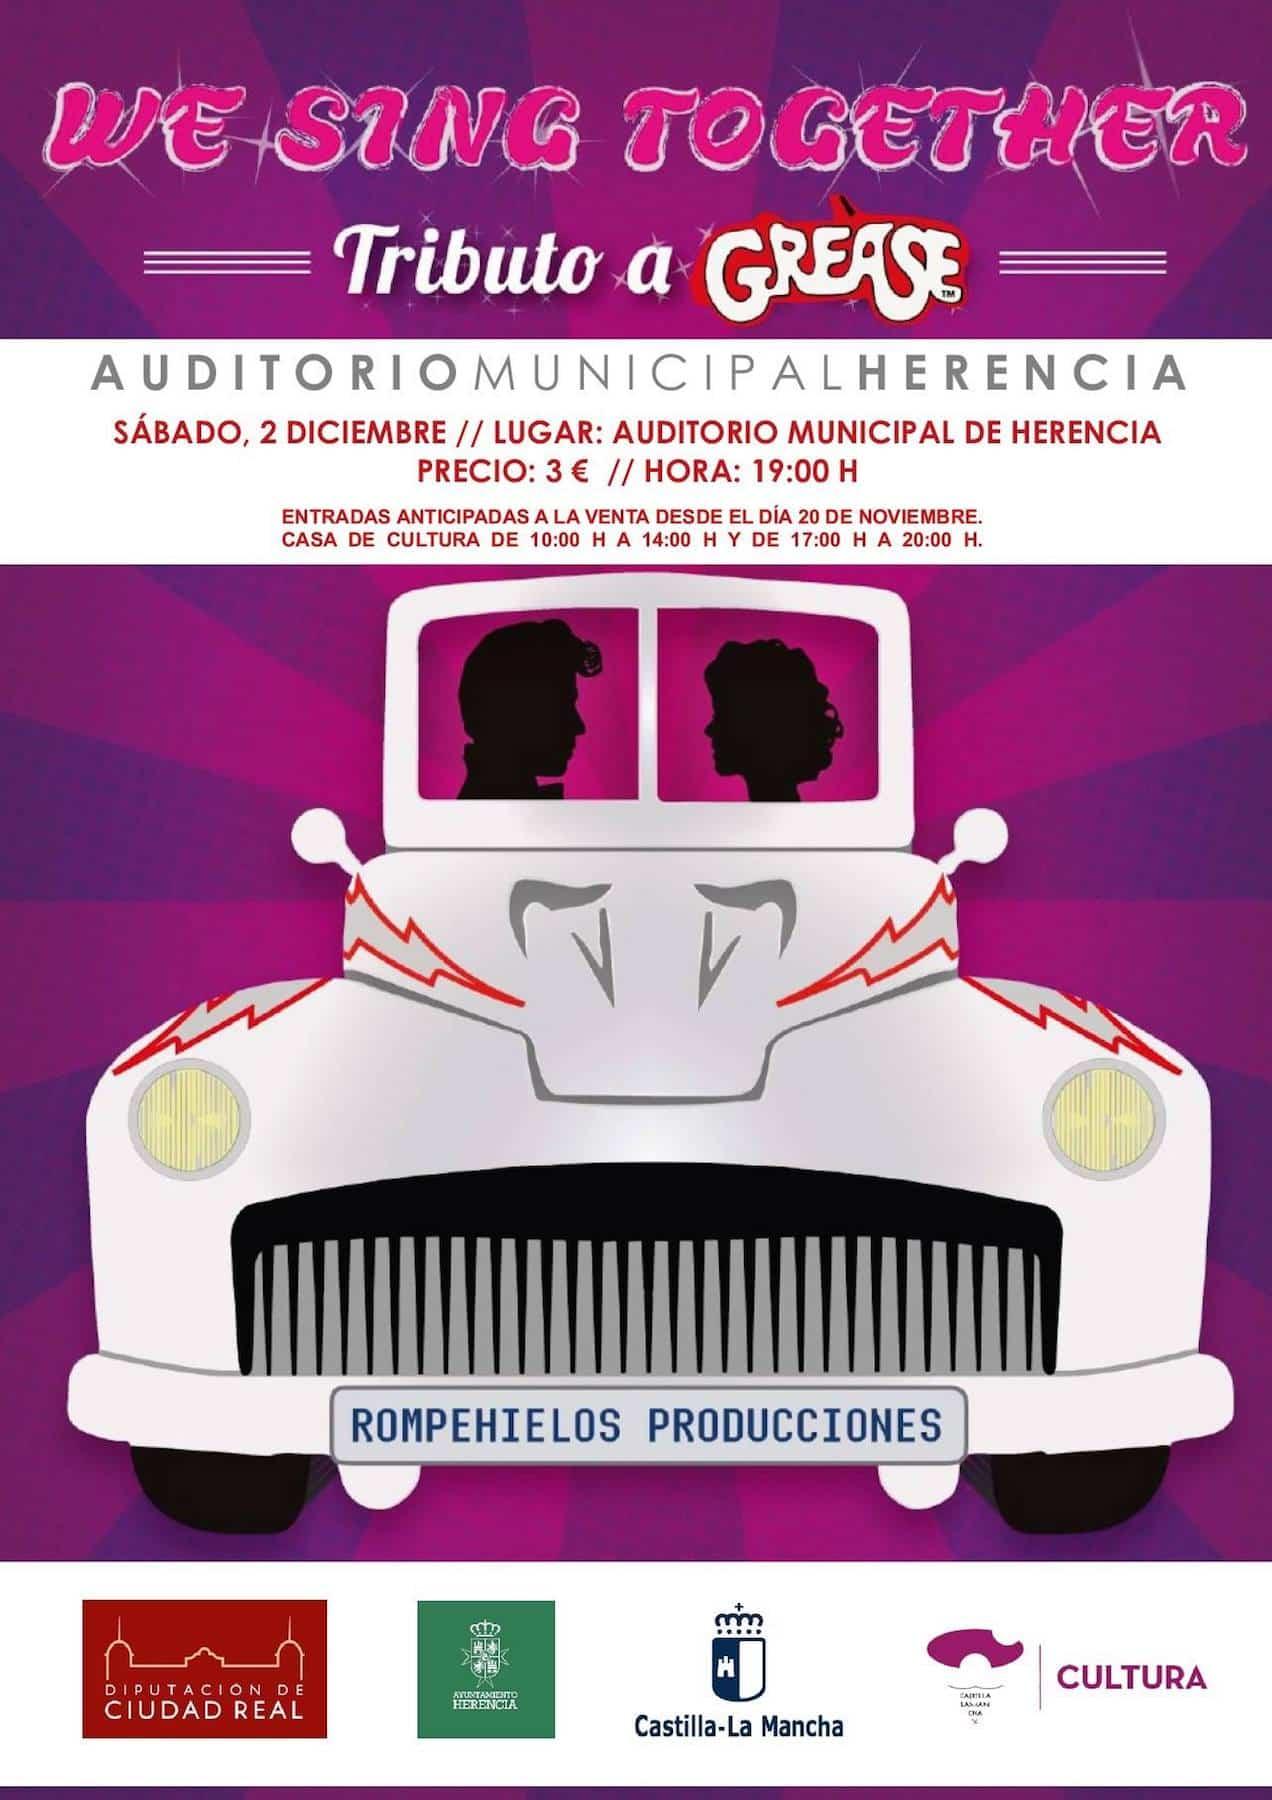 we sing together tributo a grease - Tributo a Grease en el Auditorio de Herencia